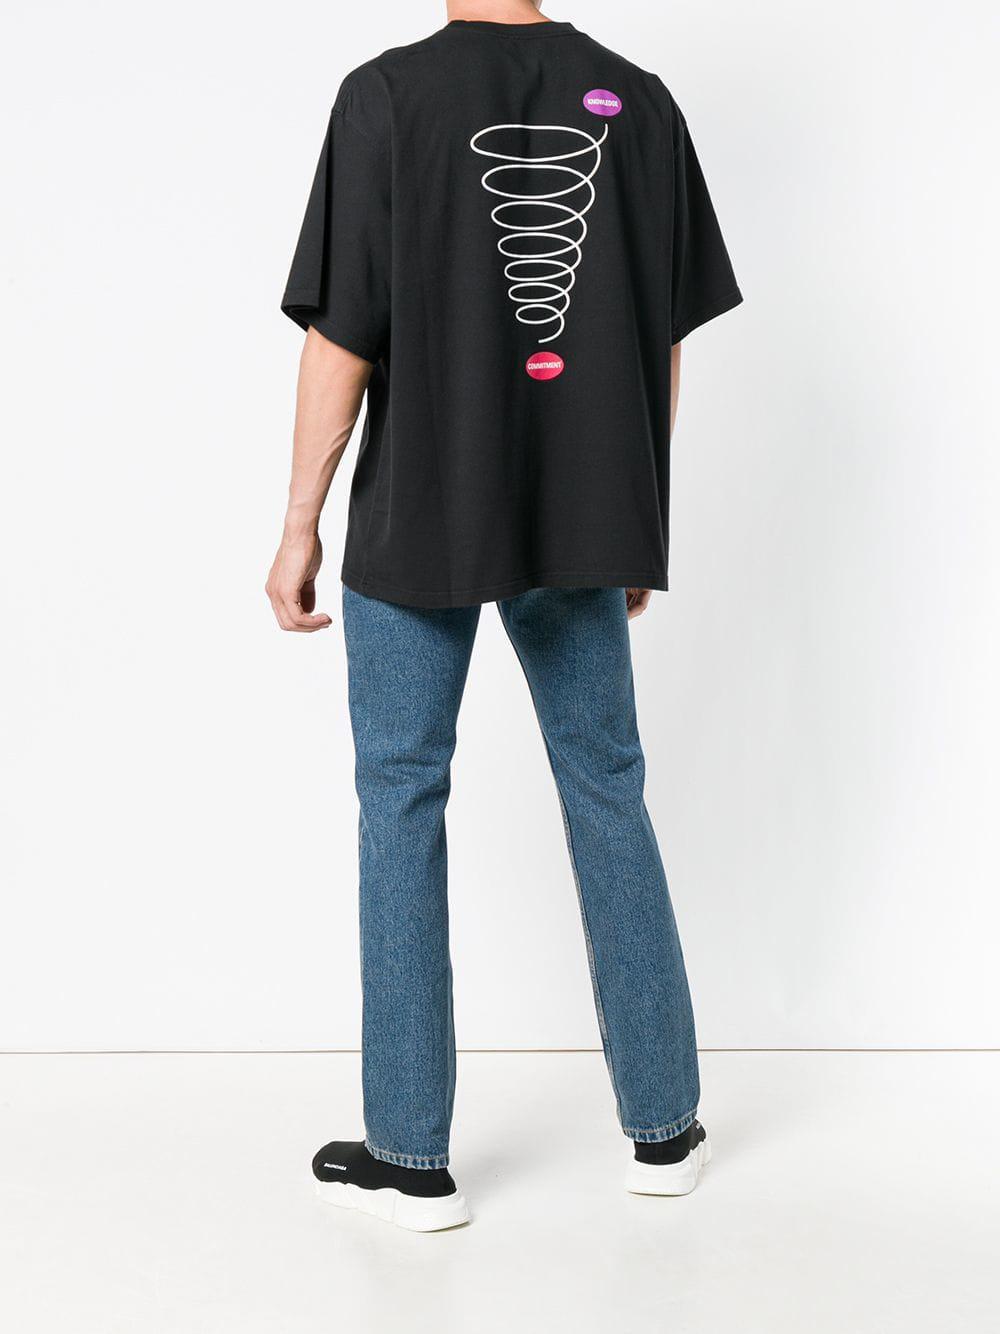 ead14a7c03a5 Lyst - Balenciaga Oversized Short Sleeve T-shirt in Black for Men